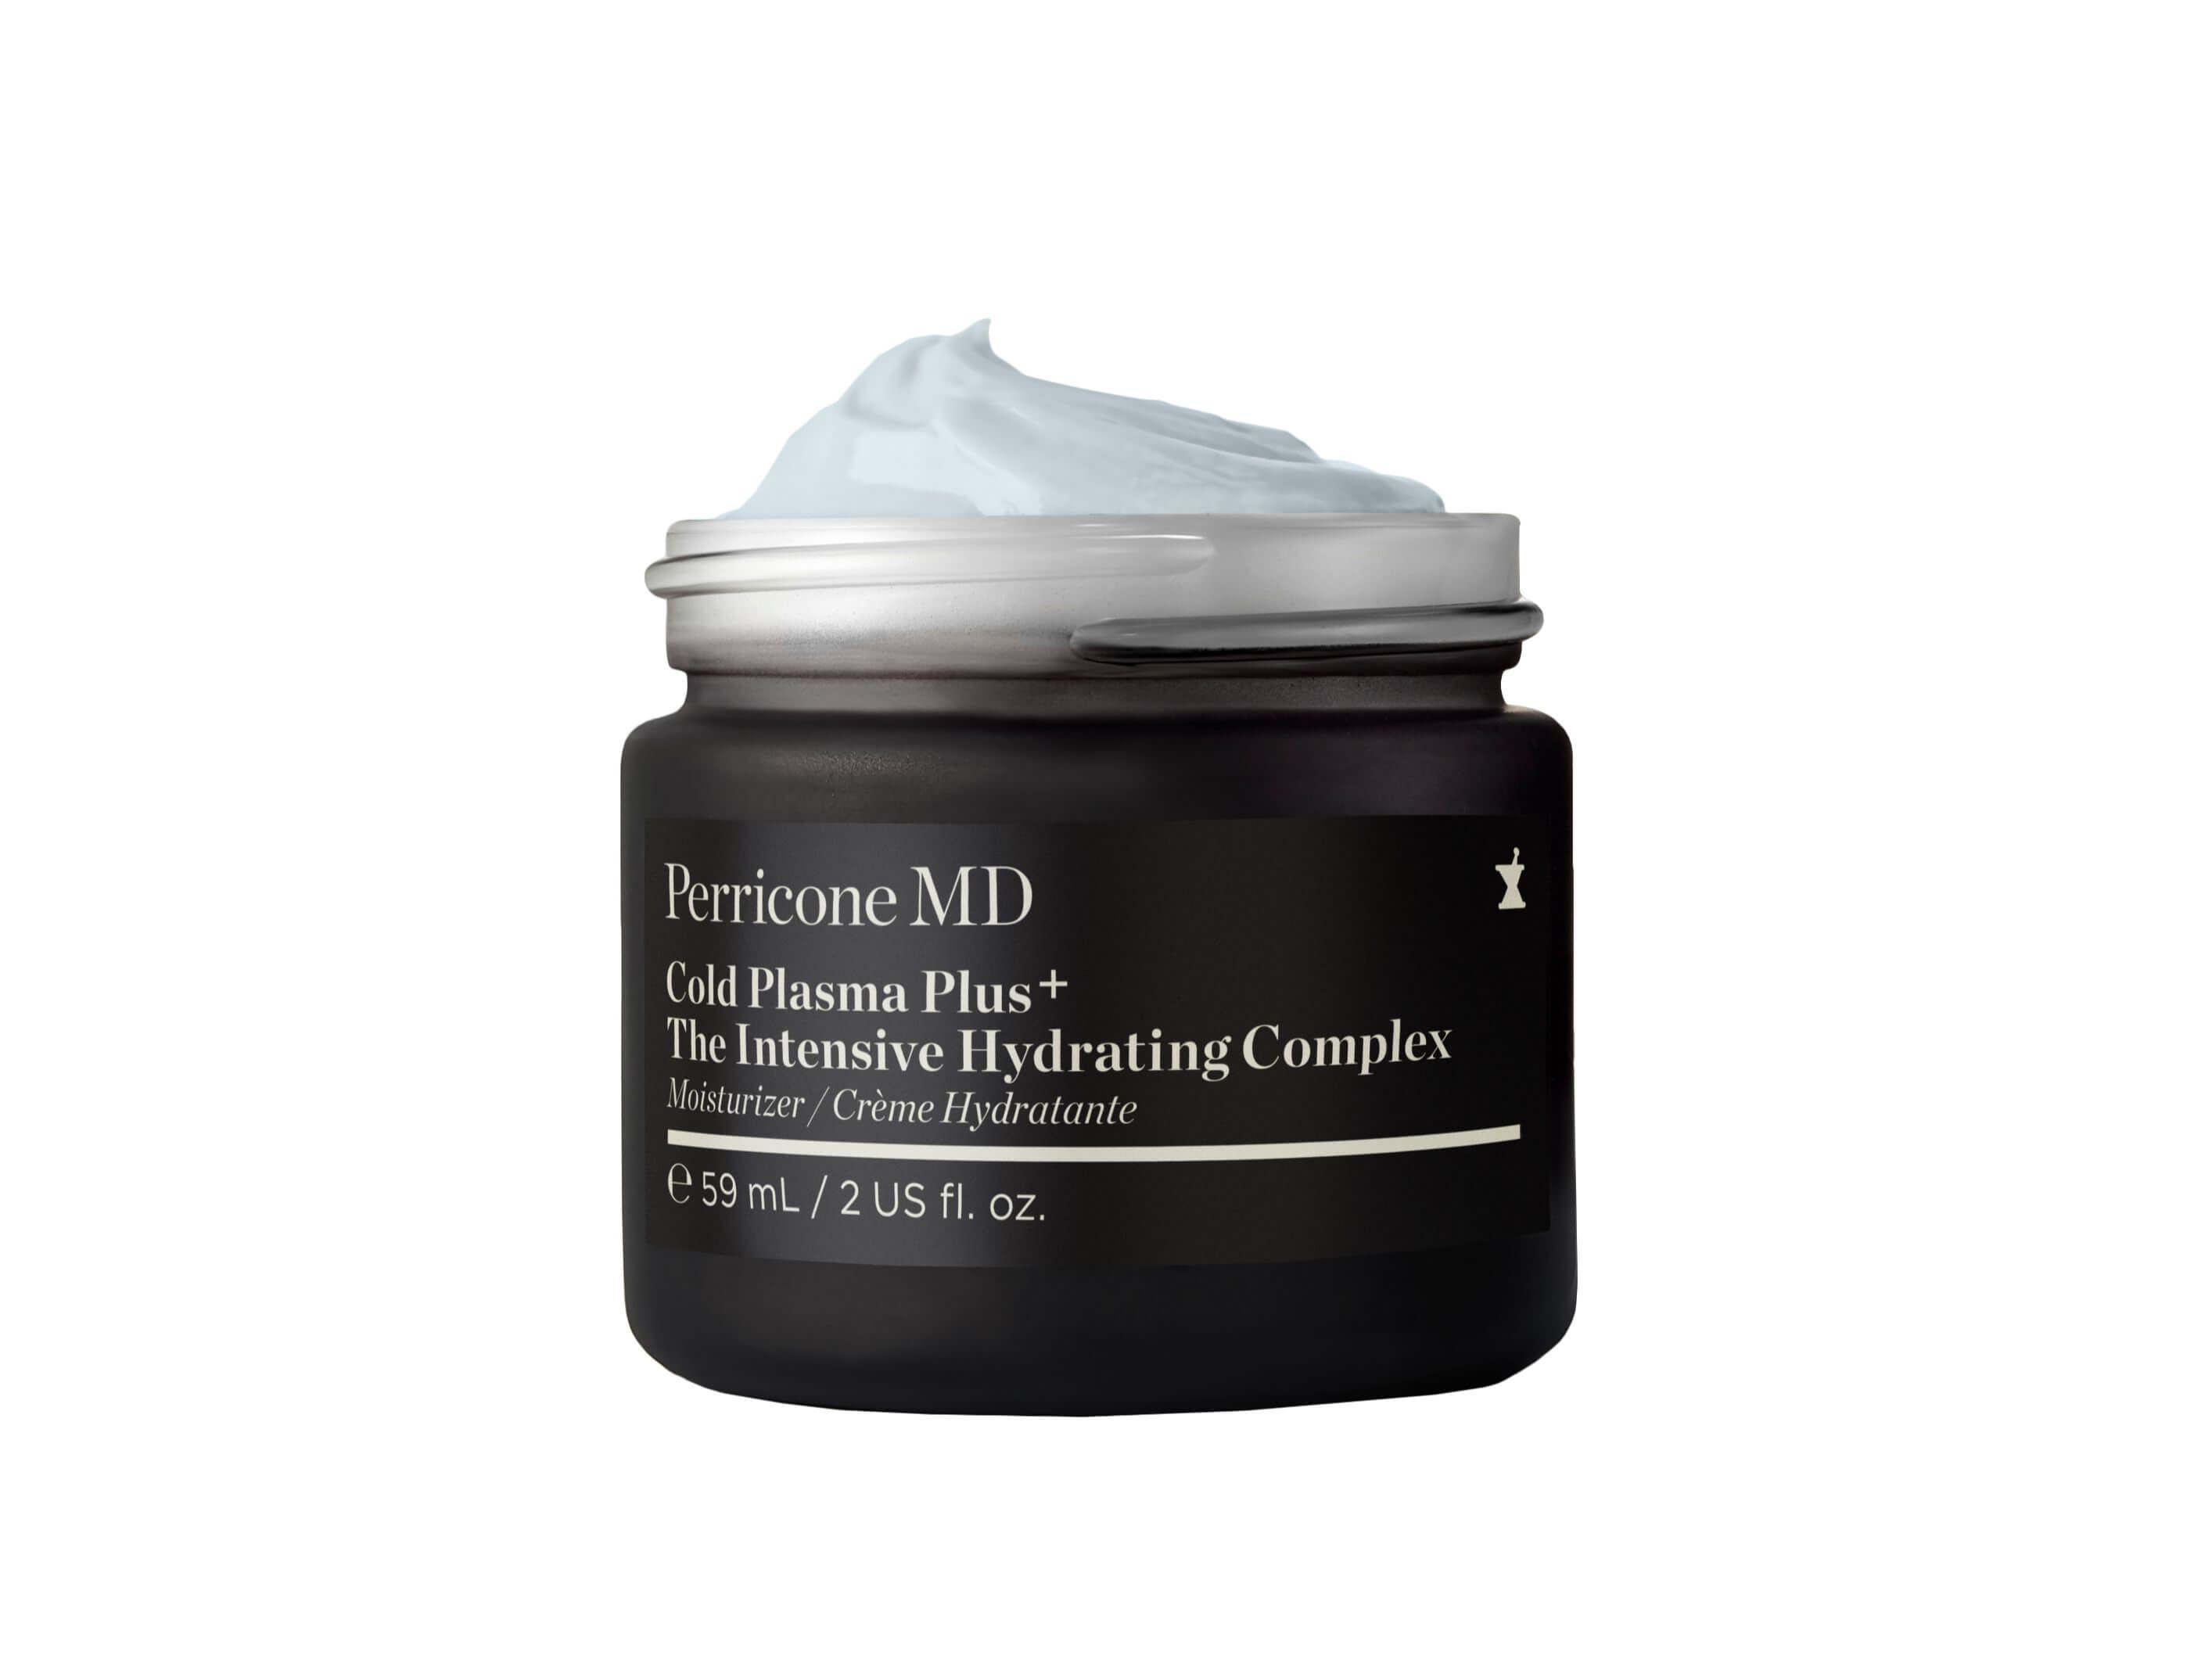 Perricone MD lanza 'Cold Plasma Plus+ The Intensive Hydrating Complex'